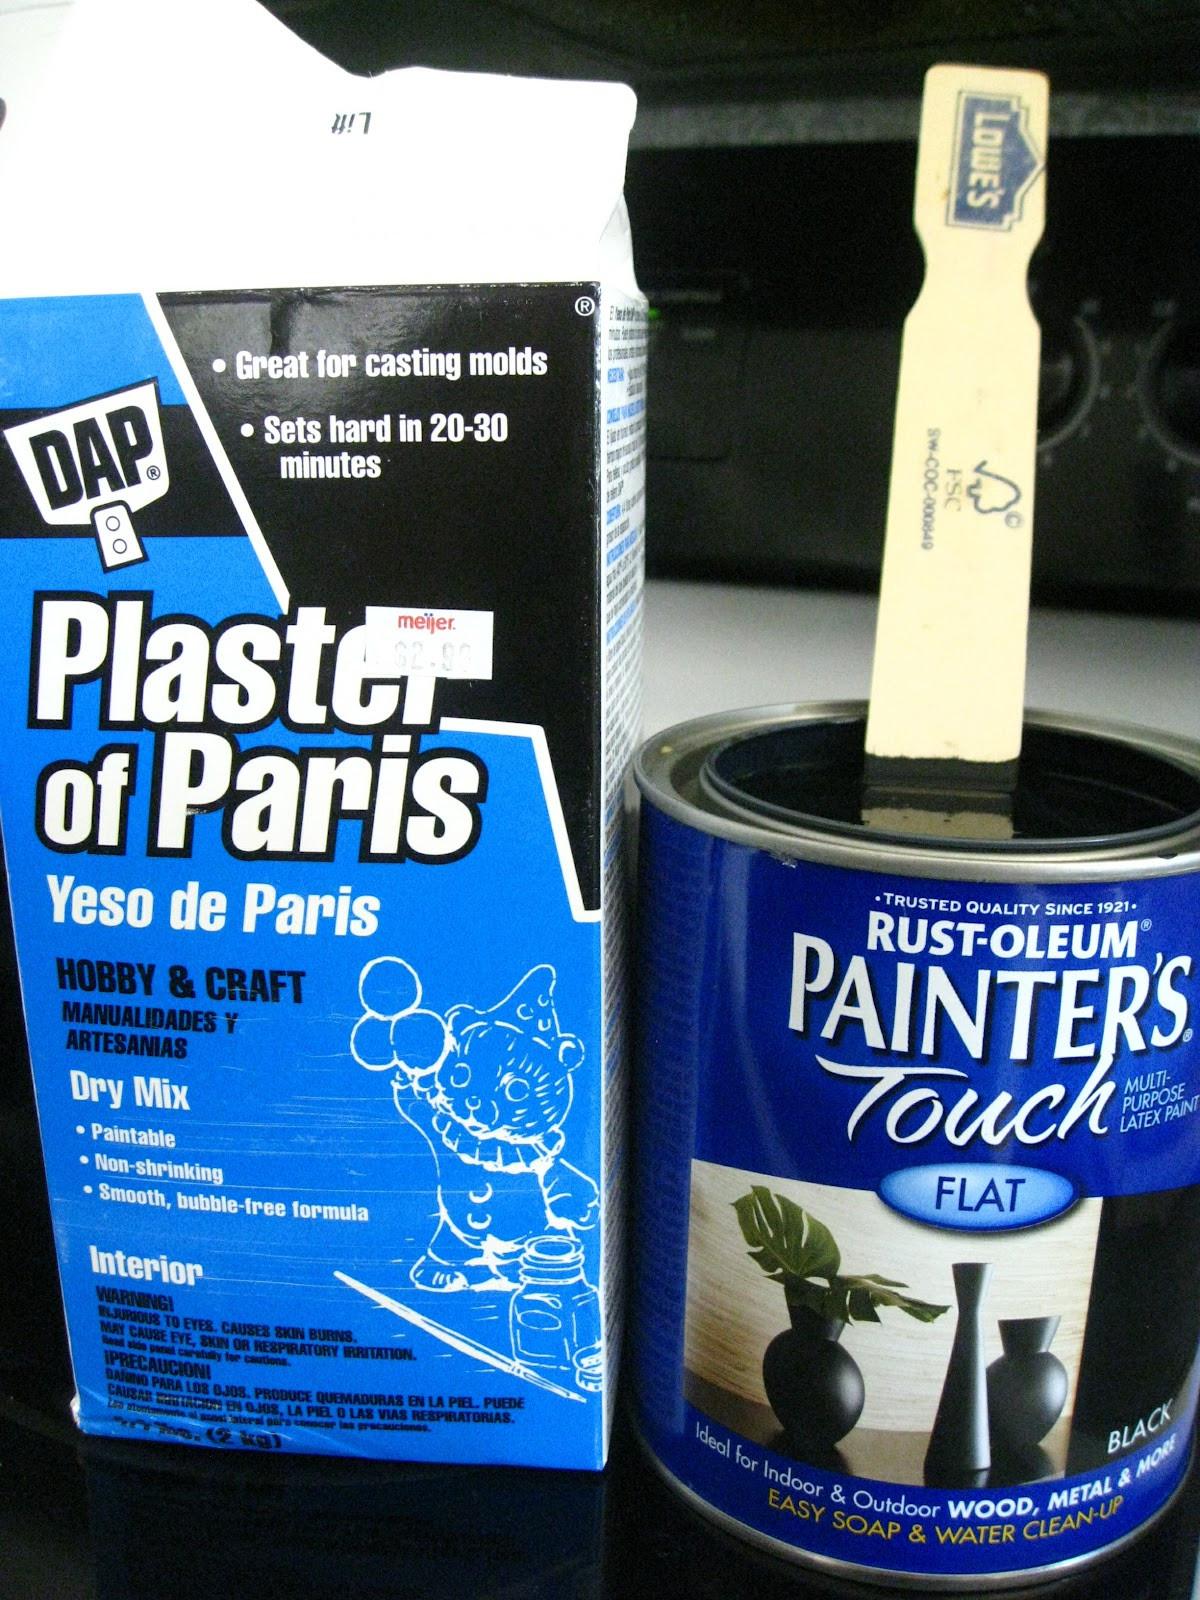 Best ideas about DIY Chalk Paint Plaster Of Paris . Save or Pin Kammy s Korner A little garage sale find a little DIY Now.